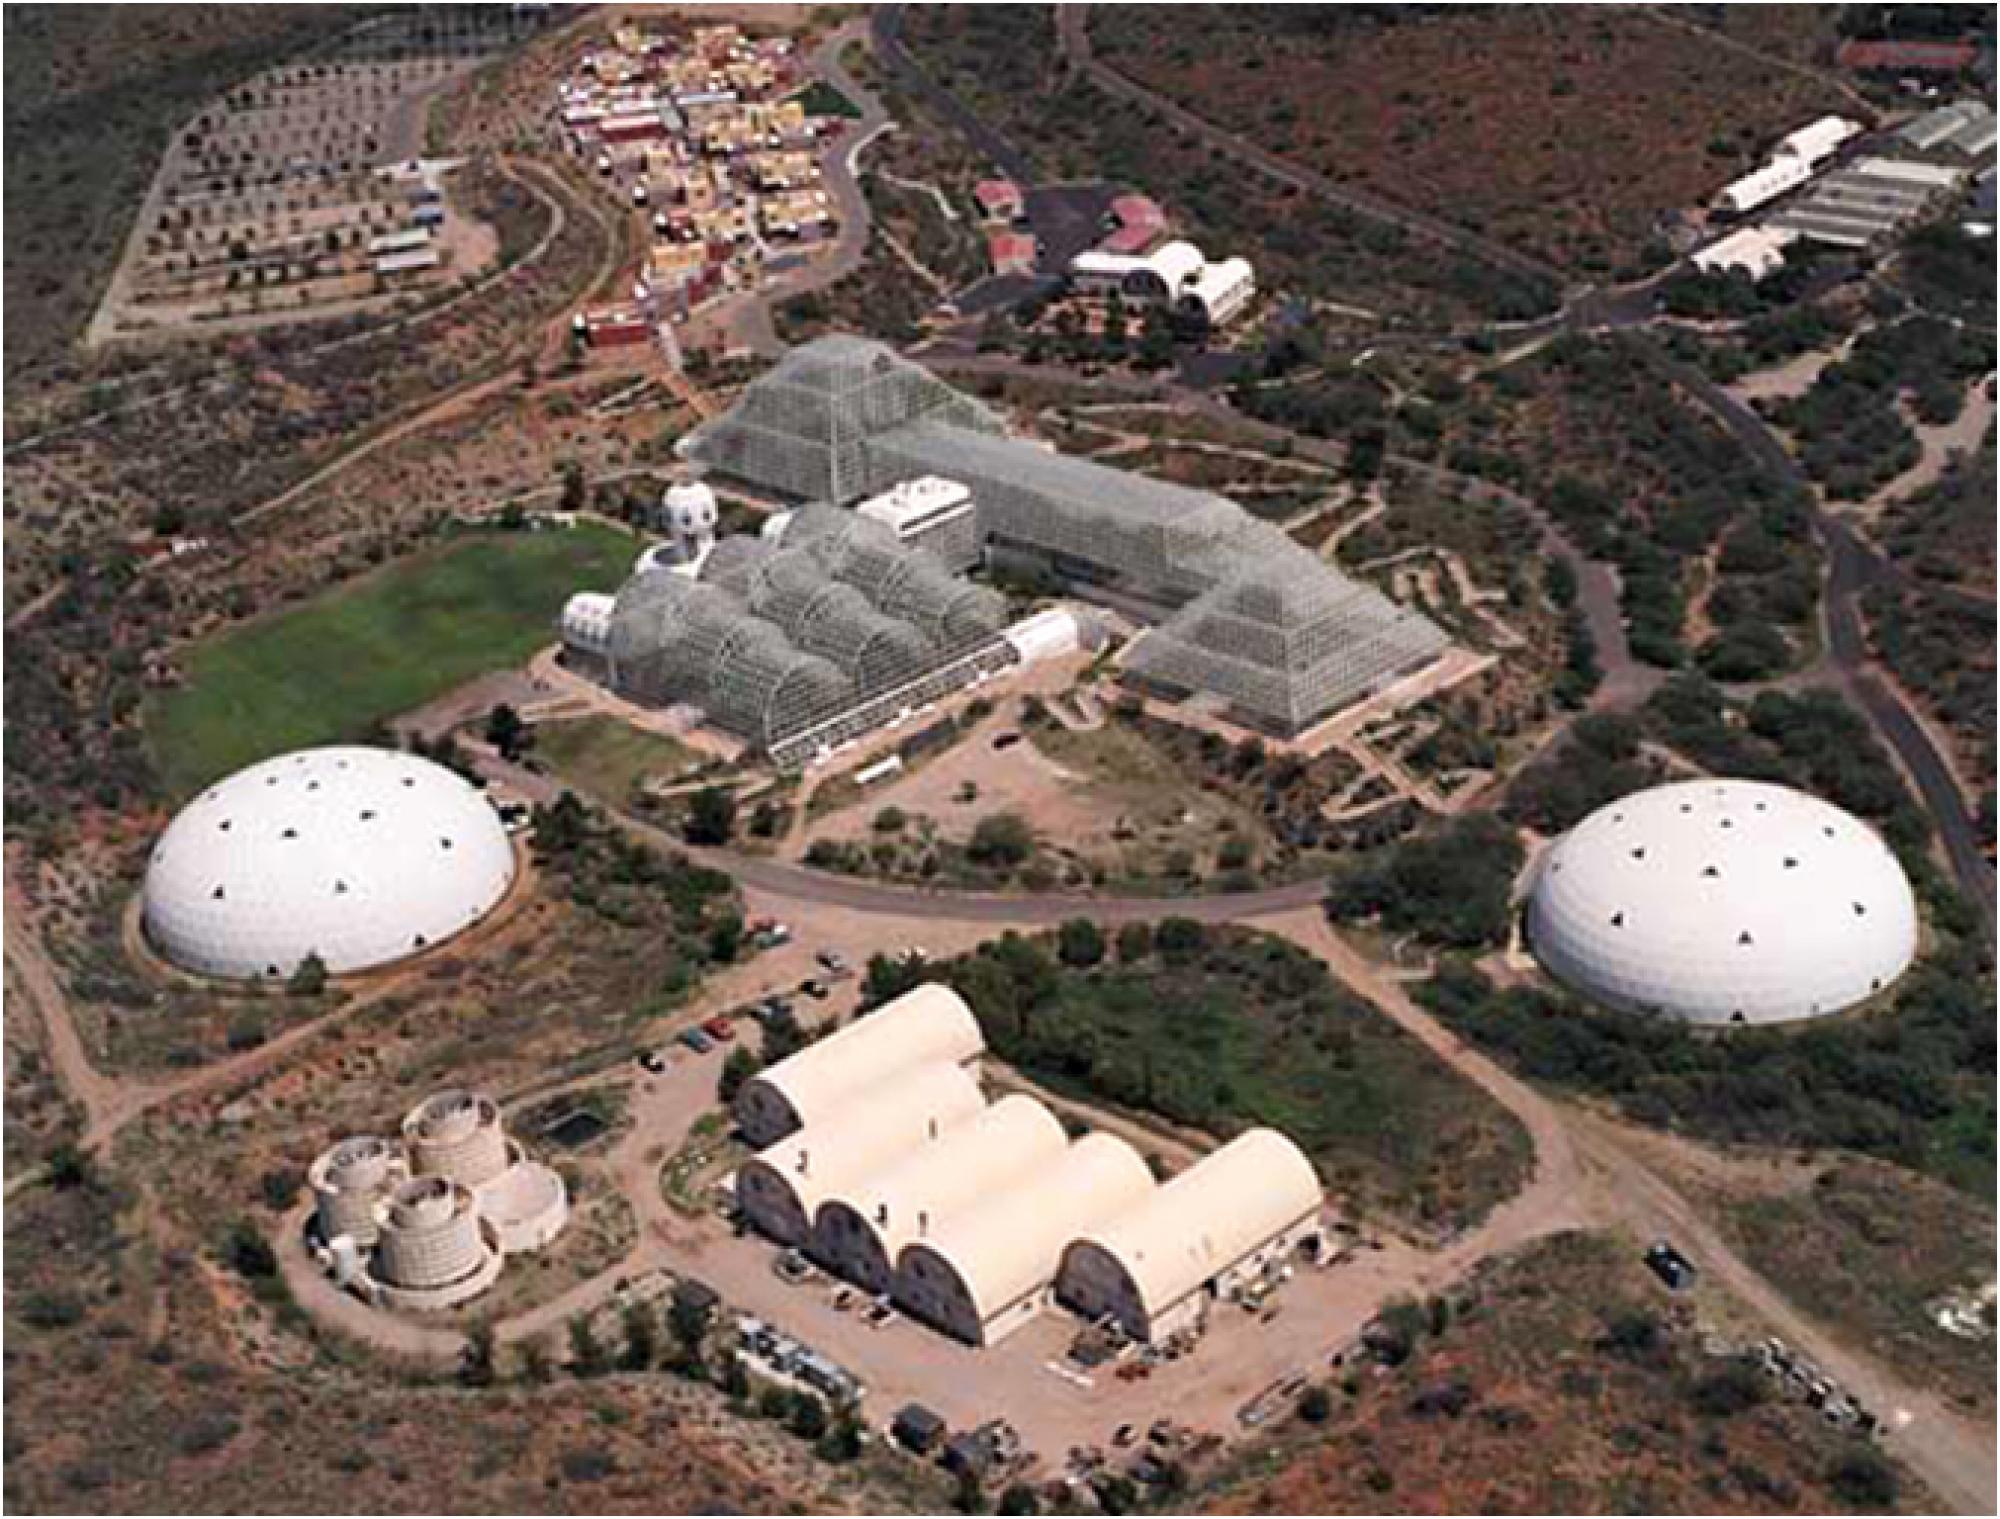 Biosphere 2, an overhead view